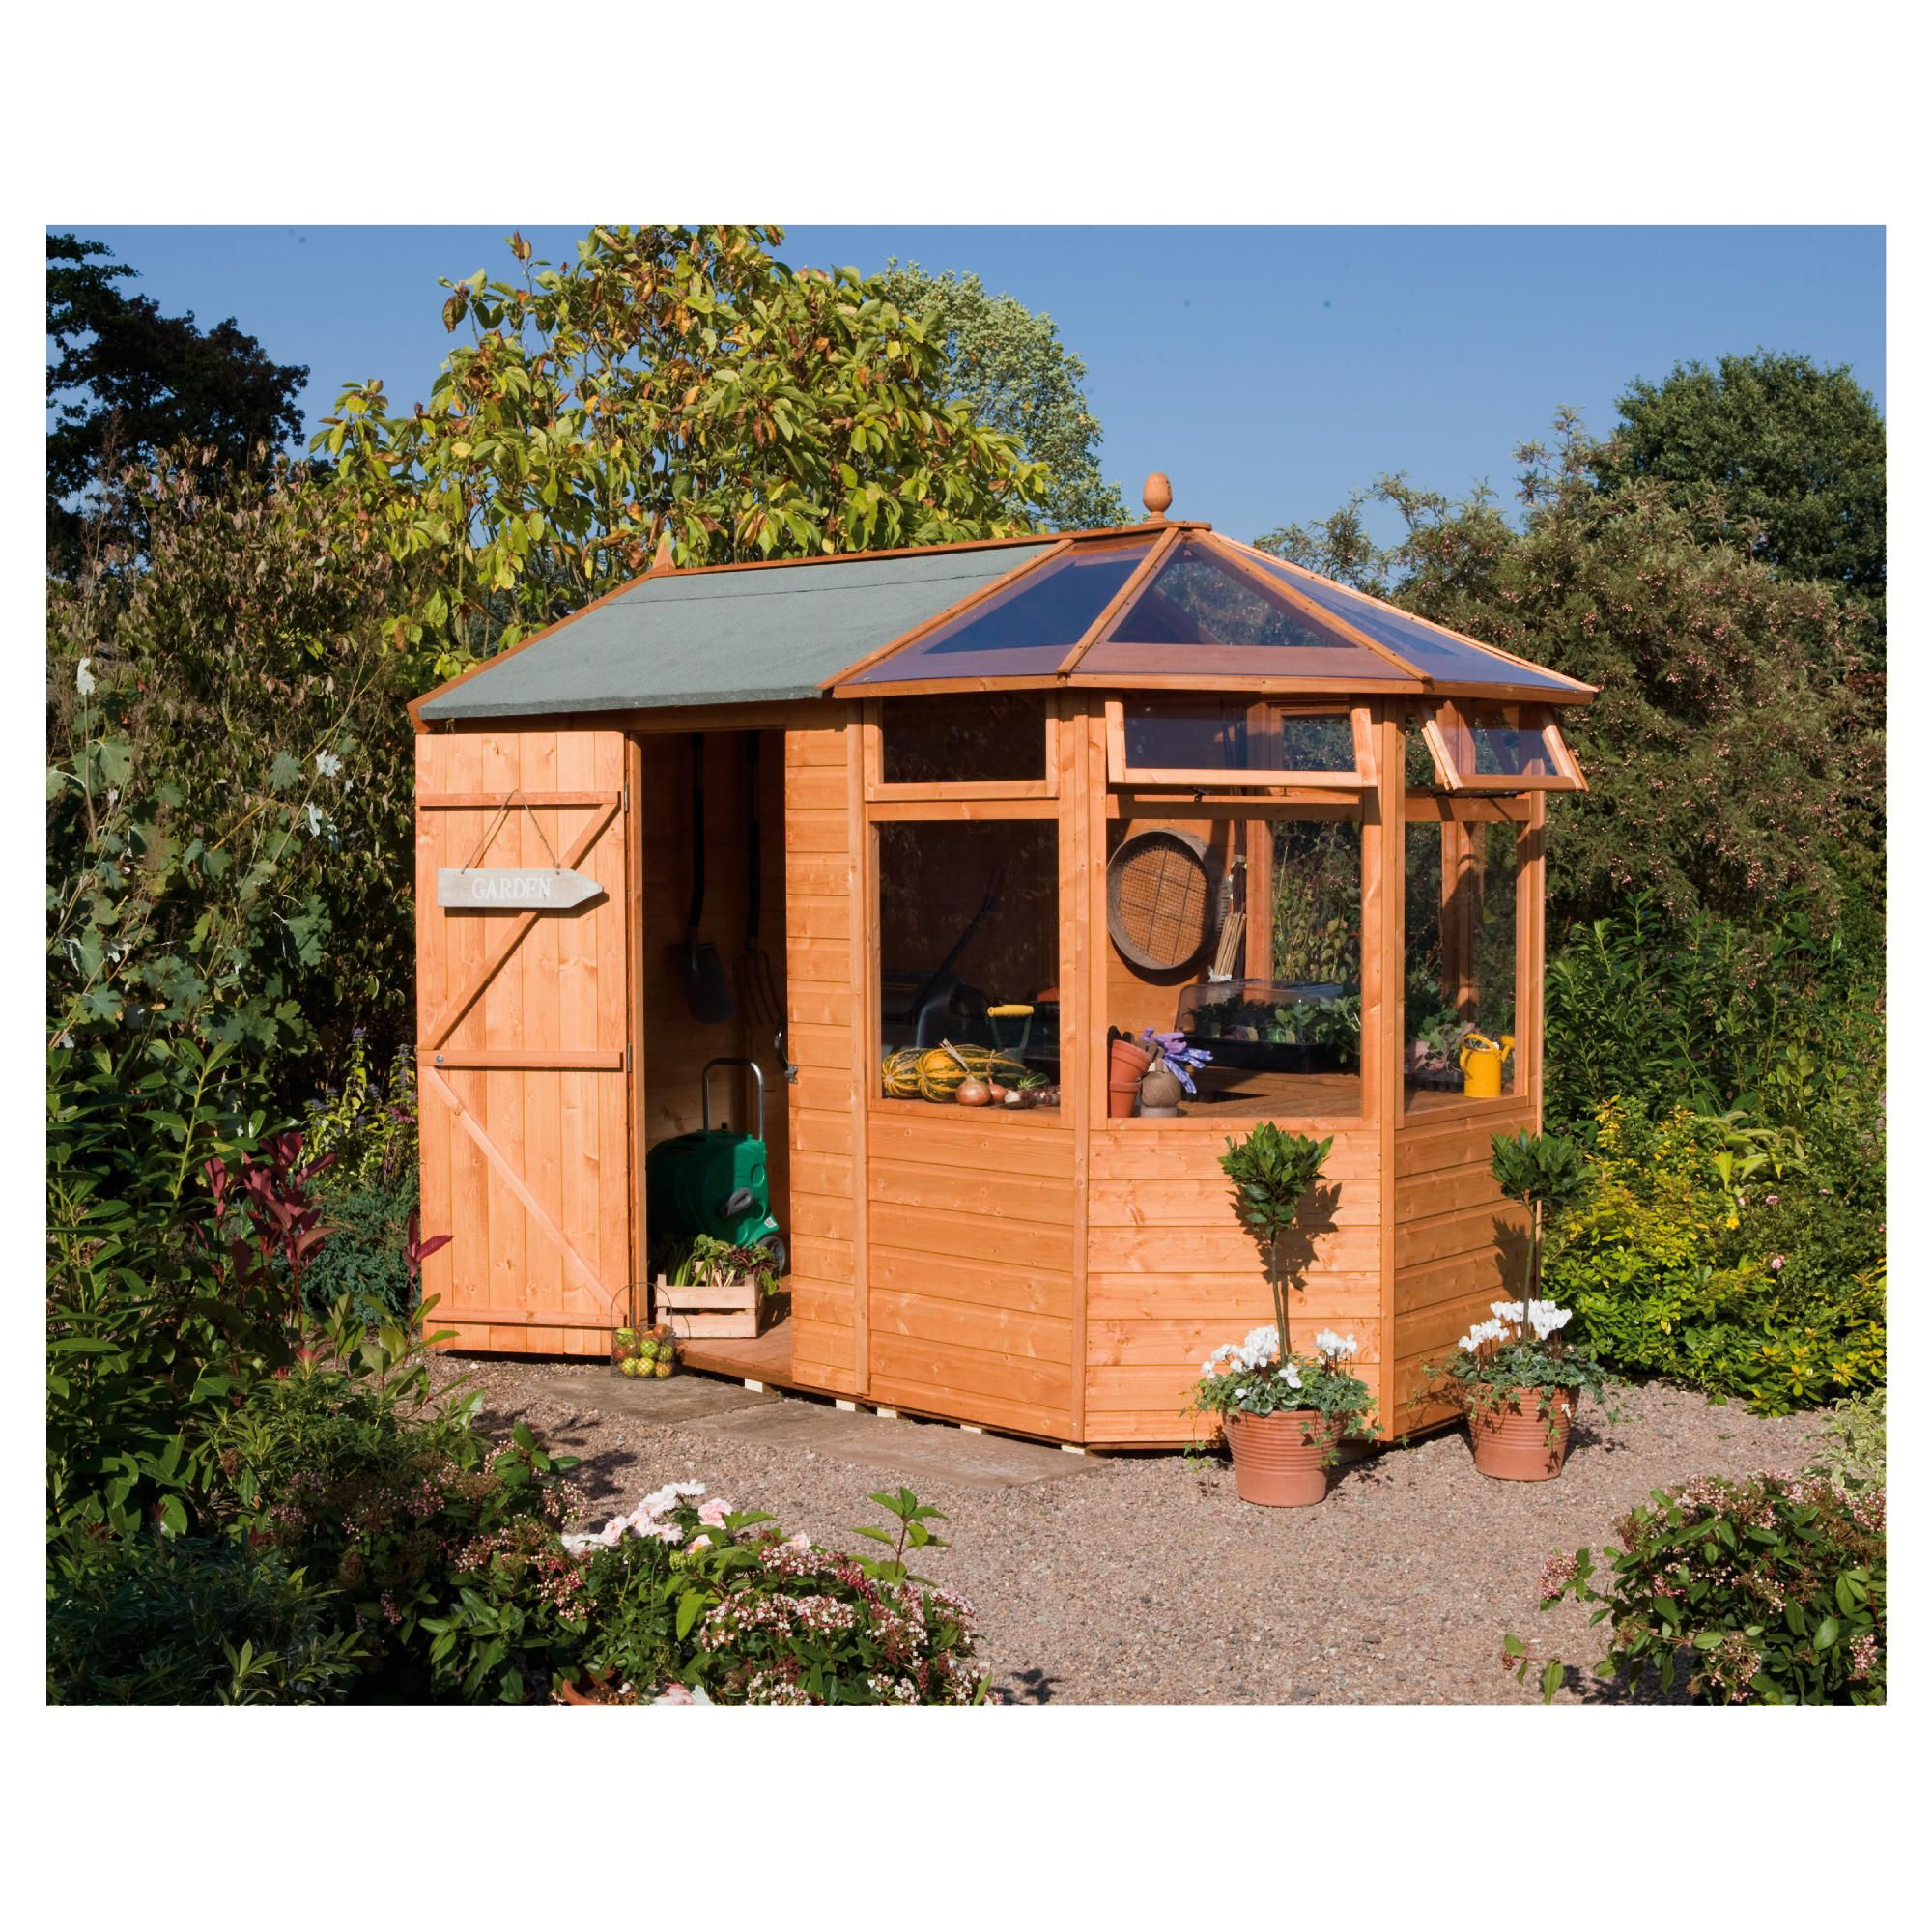 Myshop for Garden shed tesco